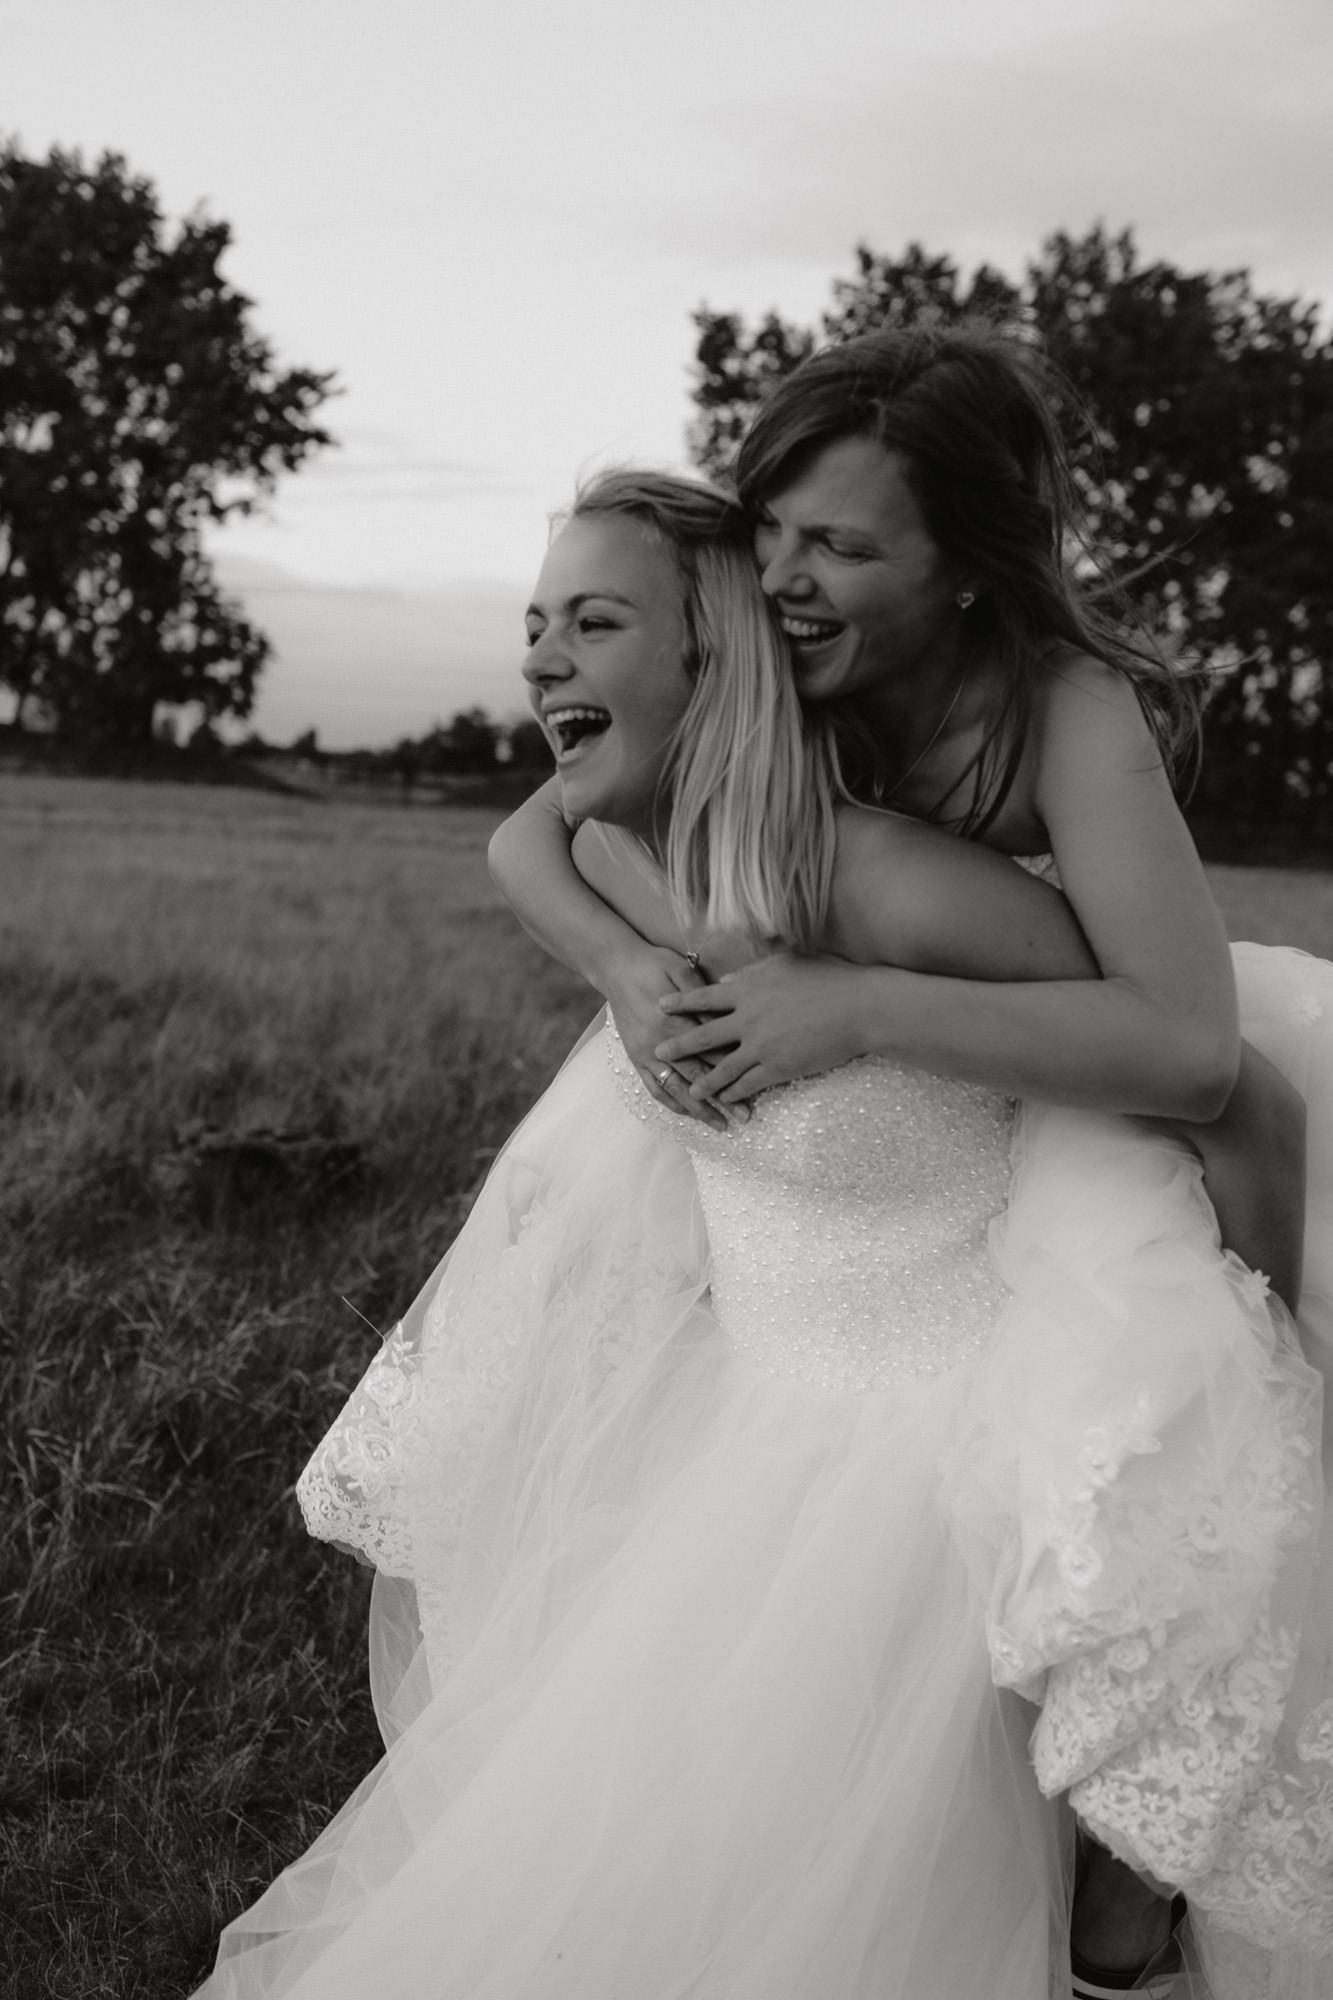 waltsmedia-hochzeitsreportage-after-wedding-shooting-berlin-29